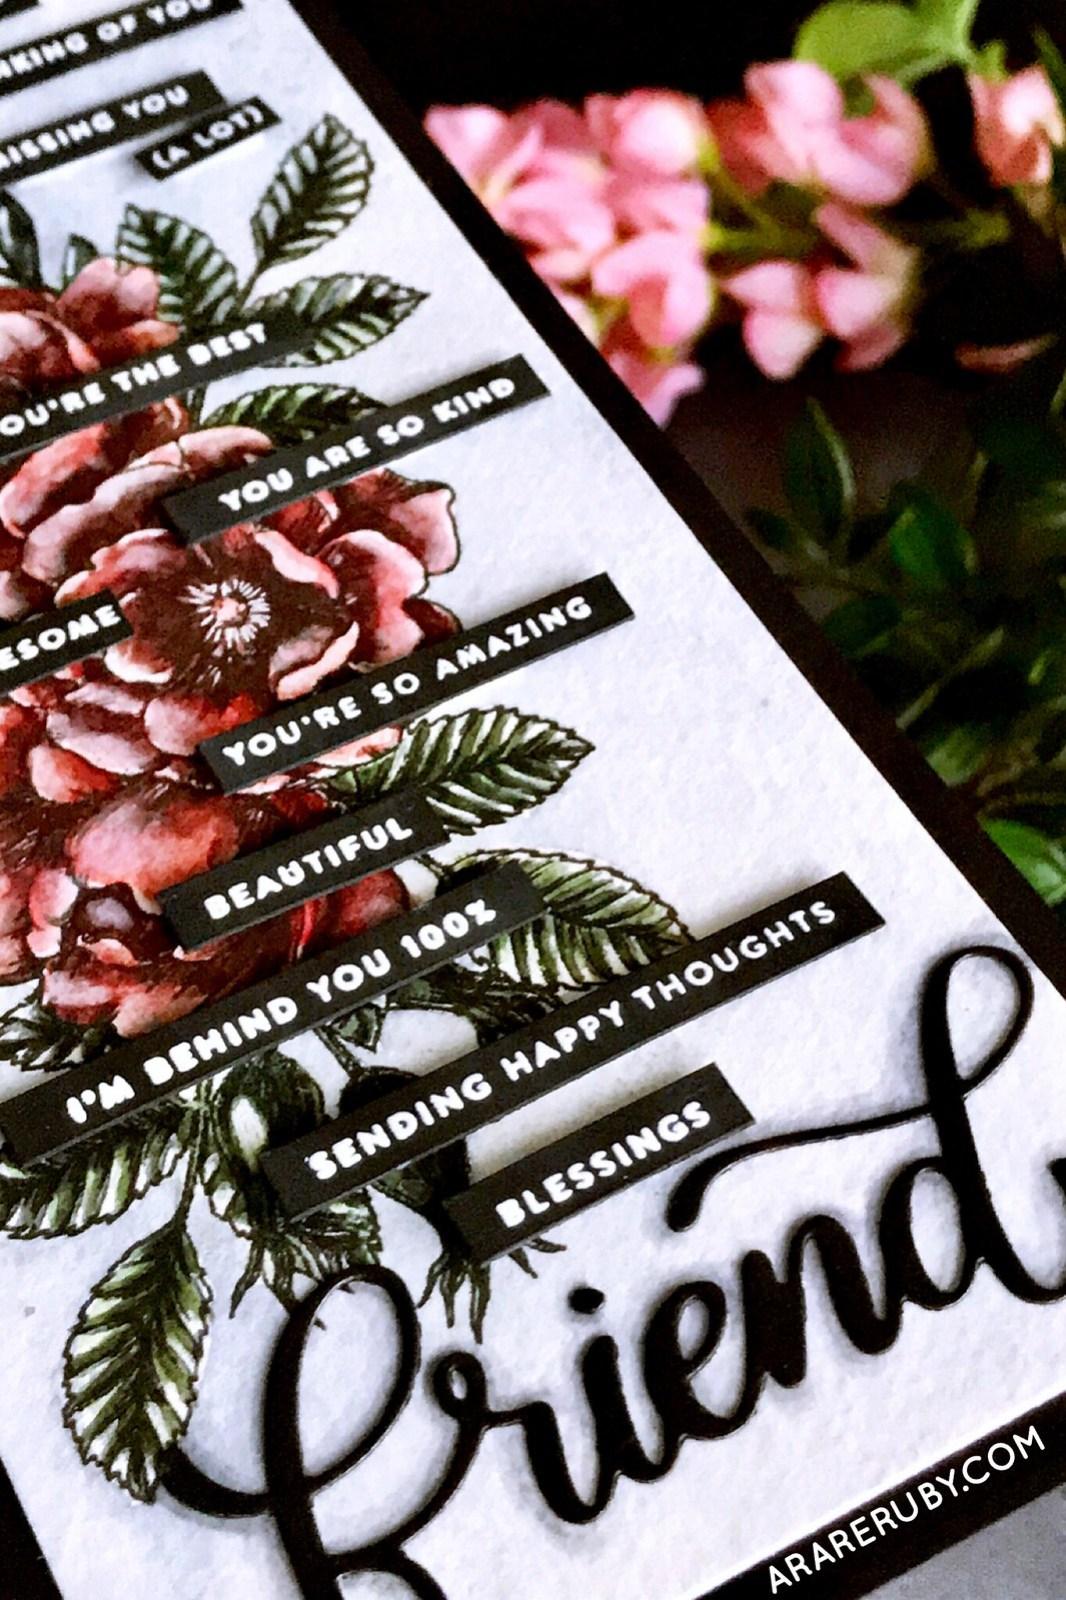 Simon Says Stamp STAMPtember 2018 - Tiny Words - Beautiful Flowers - Rubeena Ianigro